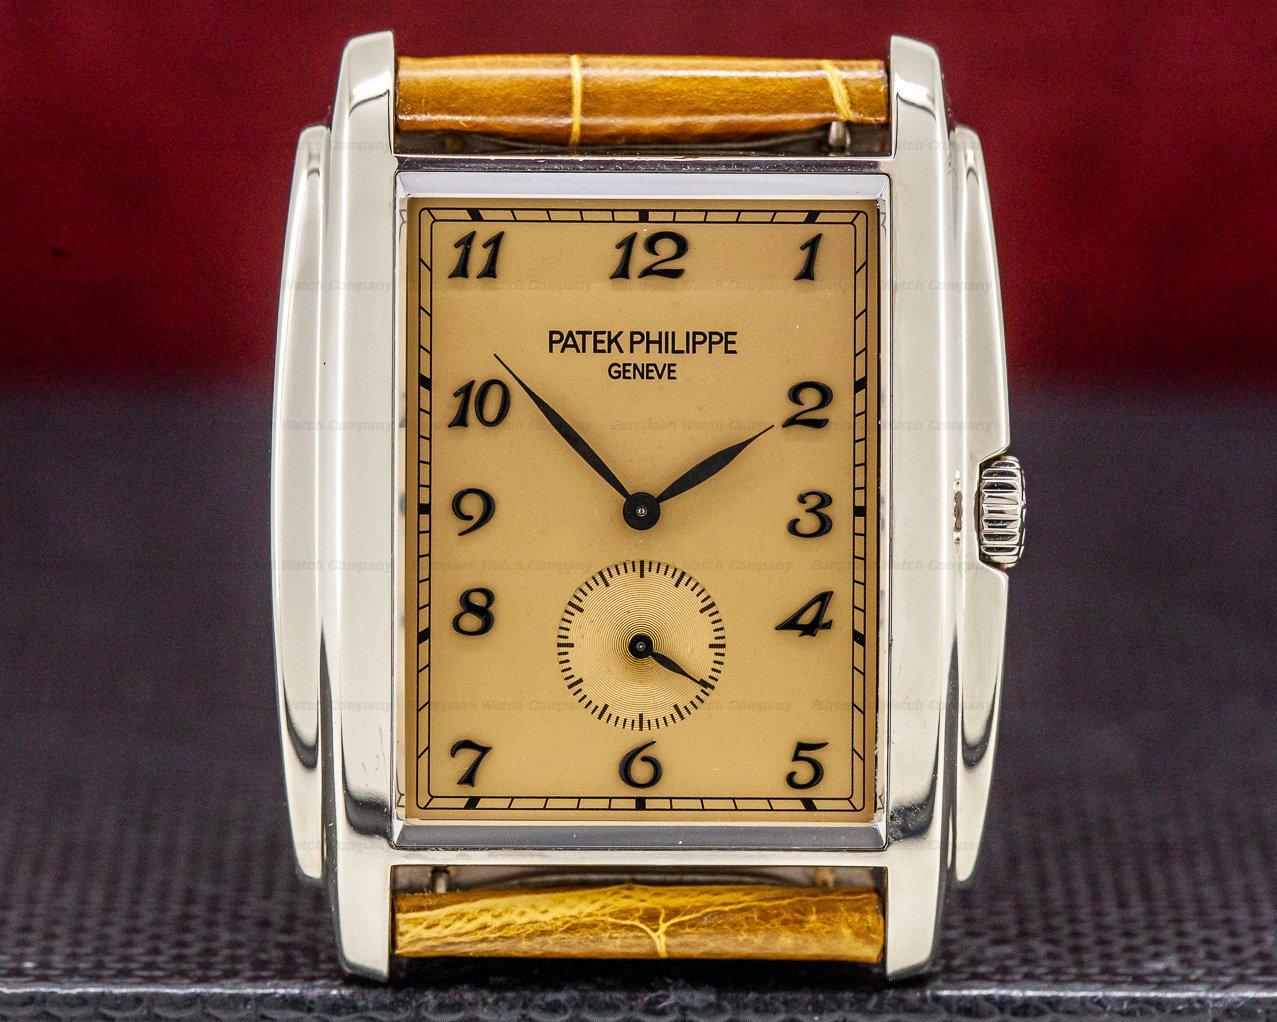 Patek Philippe 5124G-001 Gondolo 18K White Gold Manual Wind